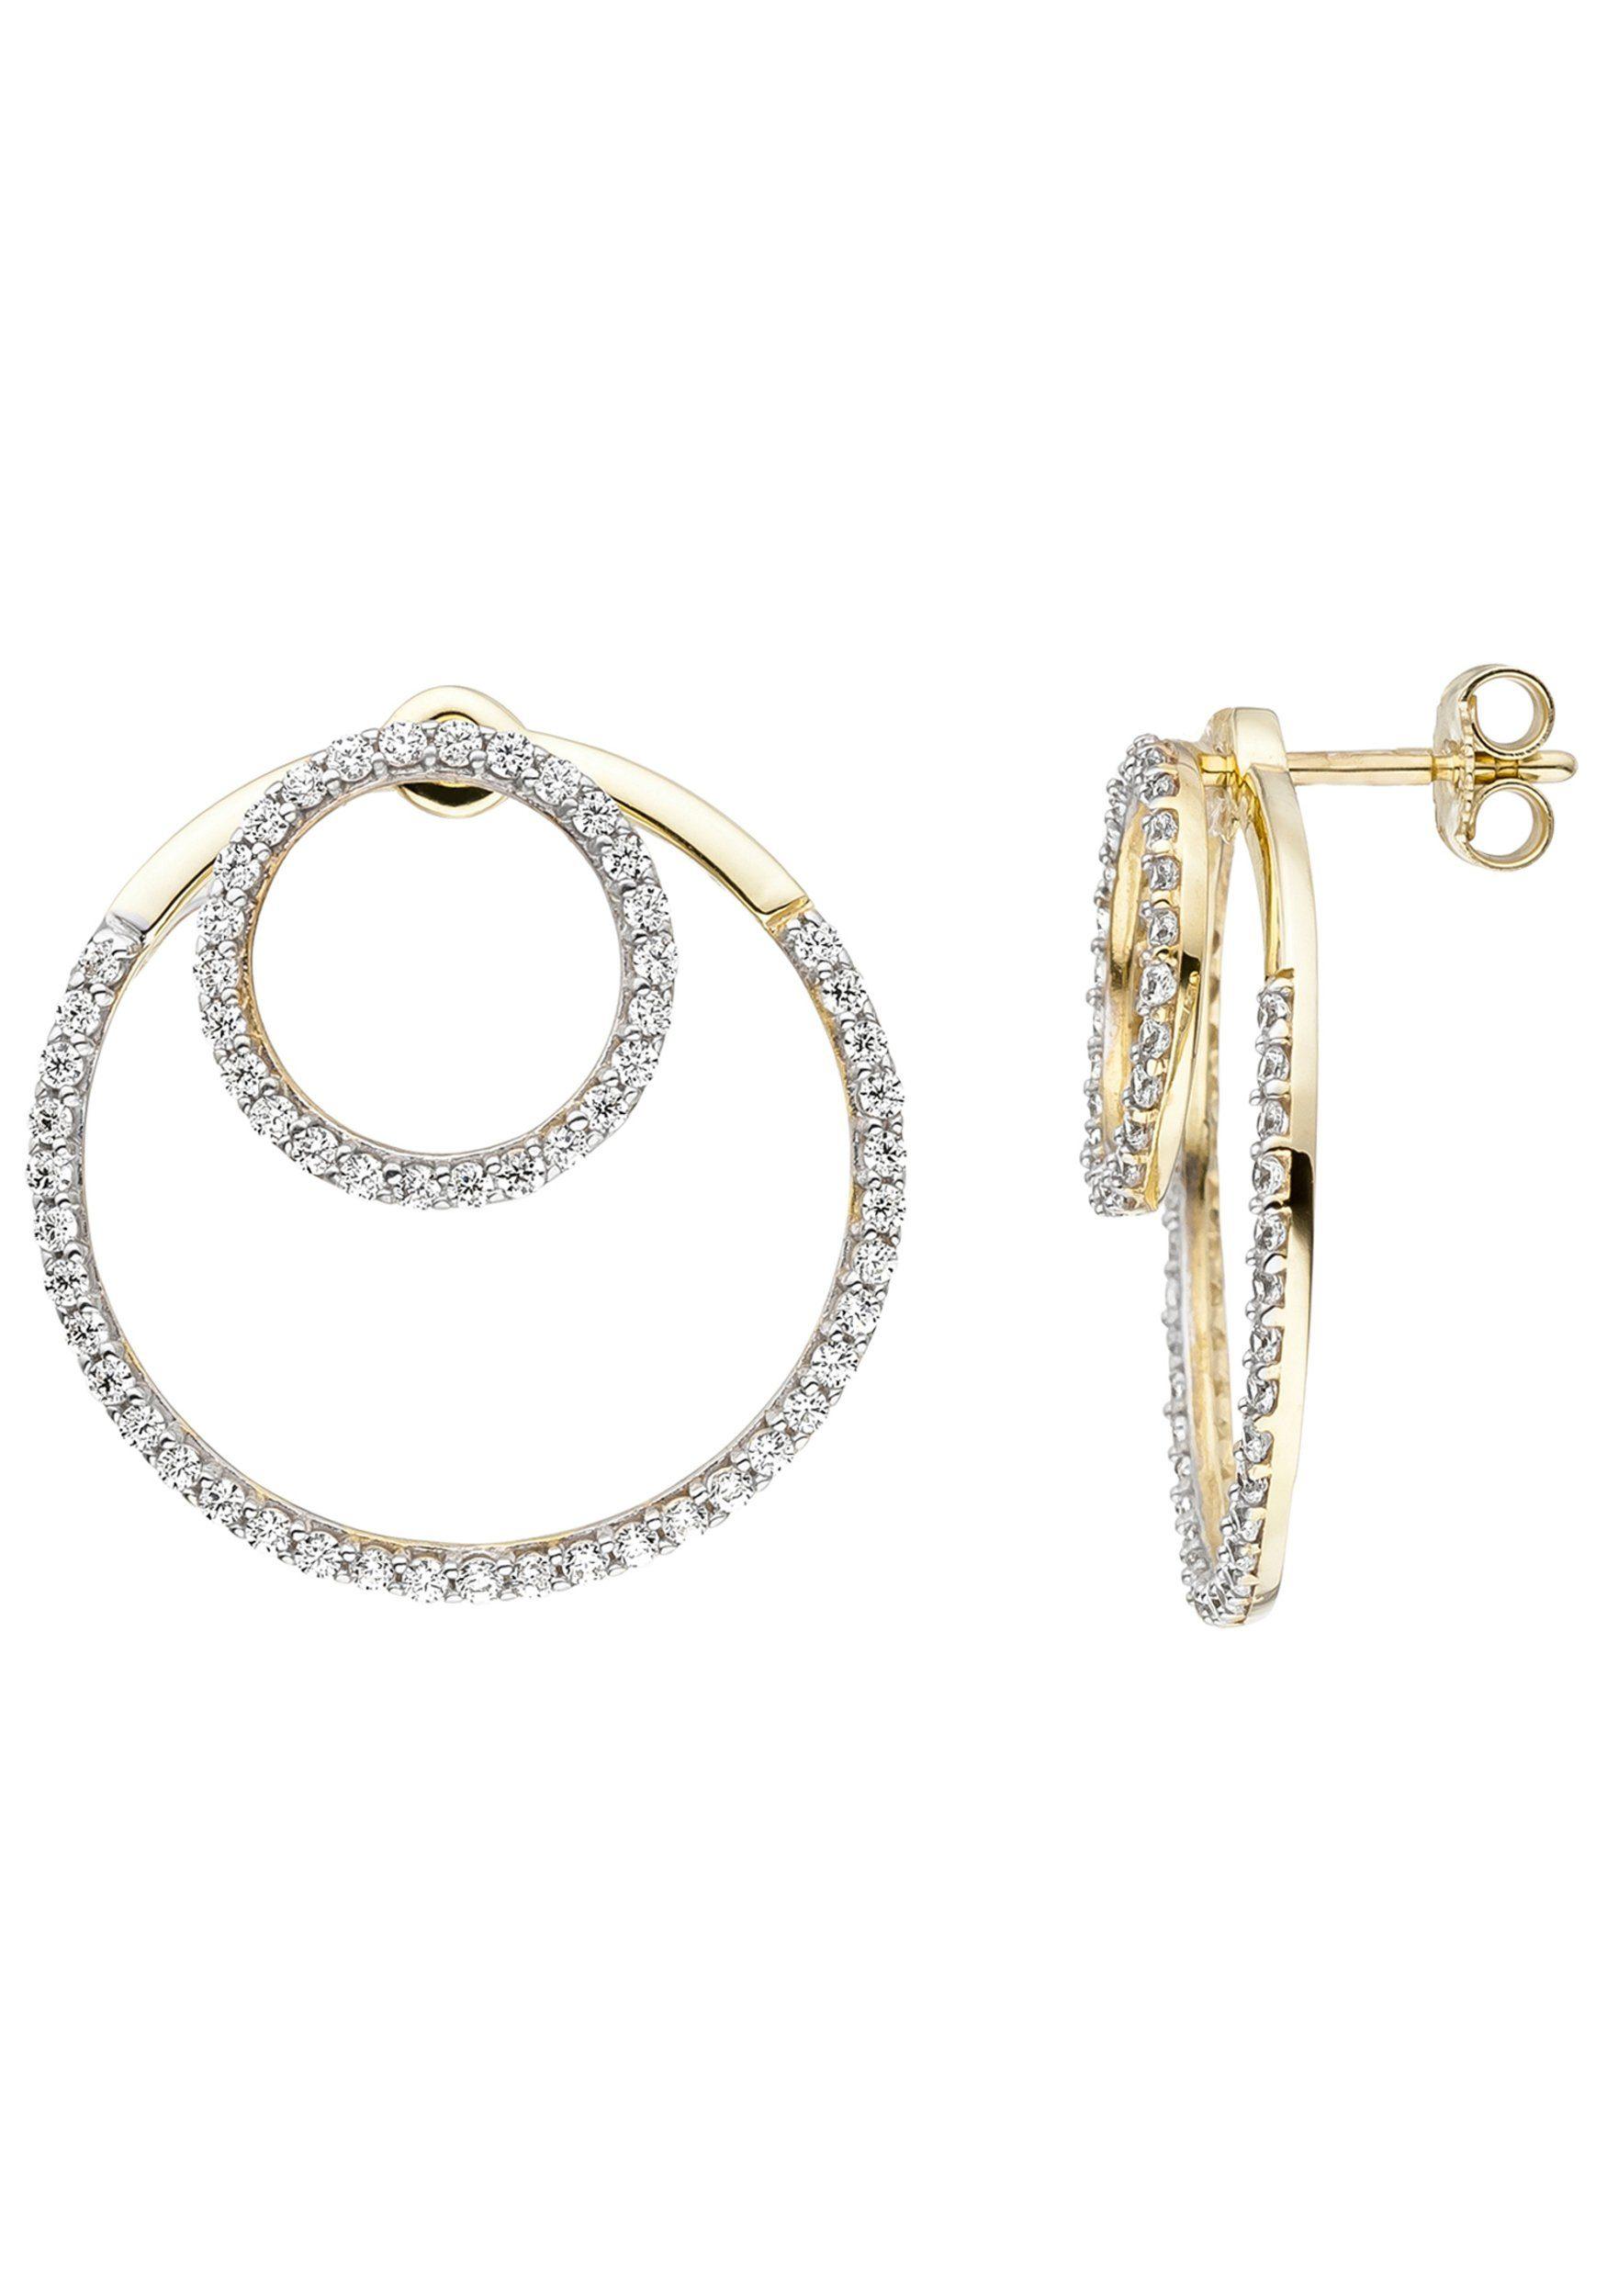 JOBO Paar Ohrhänger 375 Gold mit Zirkonia